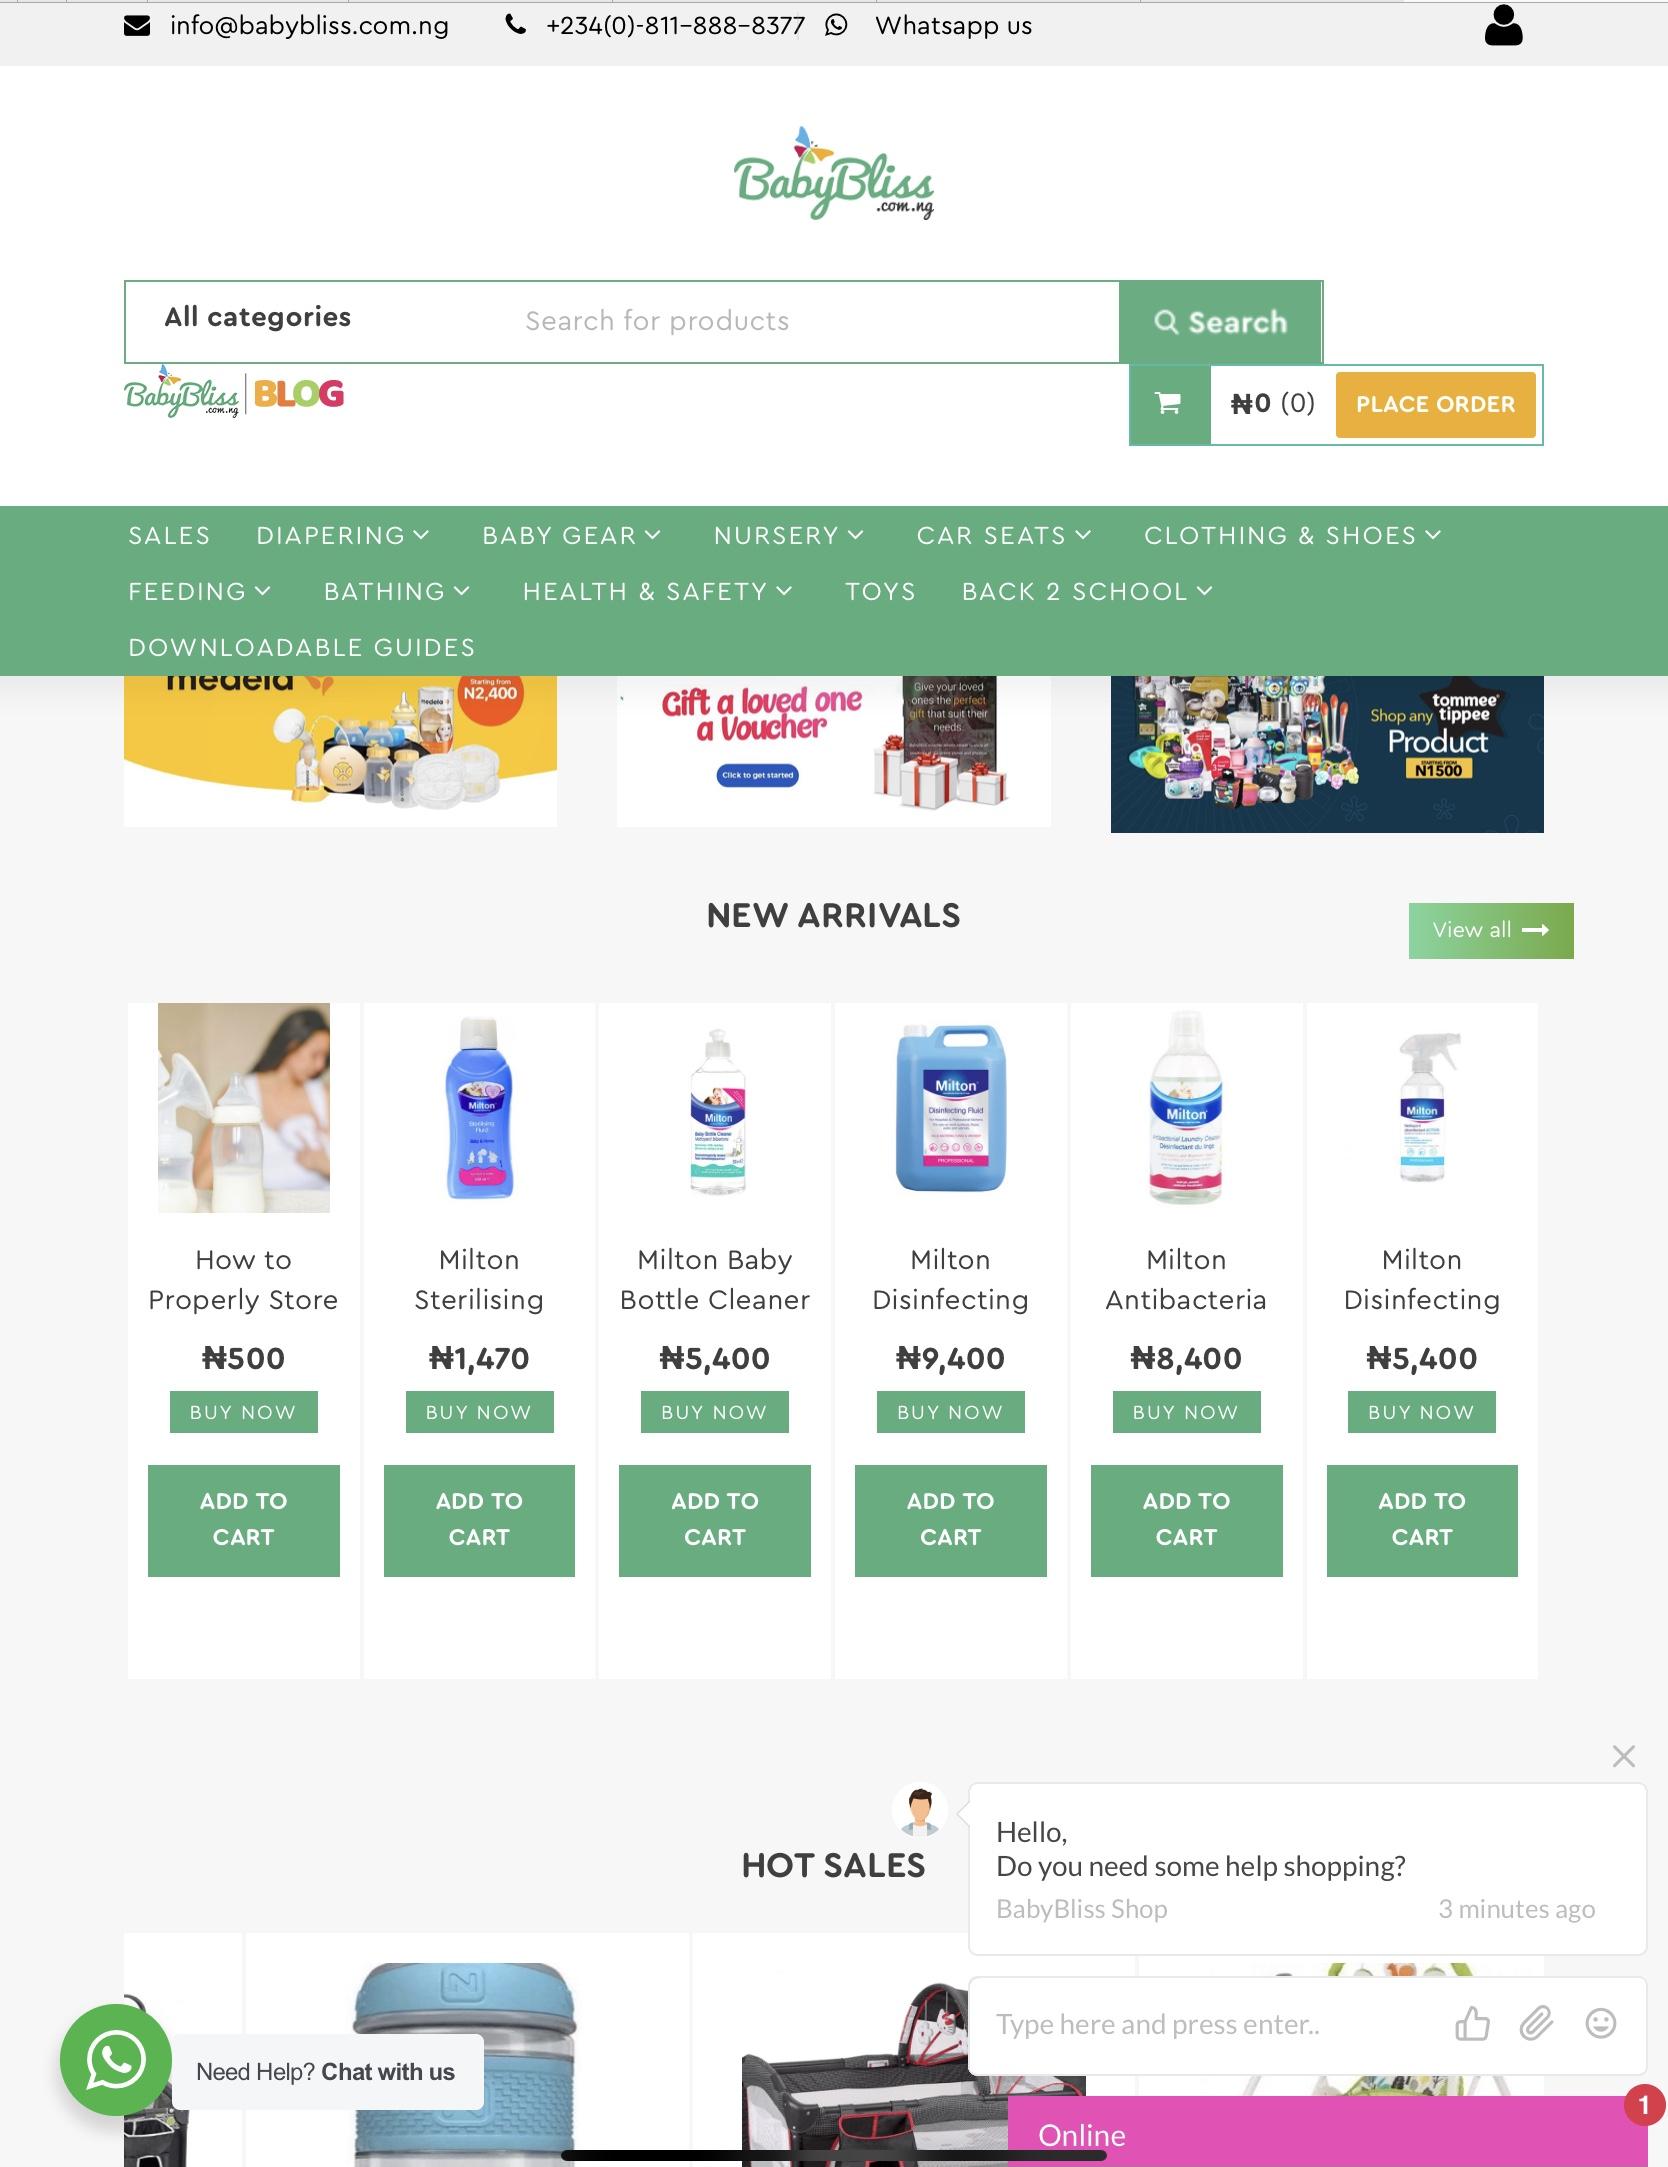 BabyBliss online store